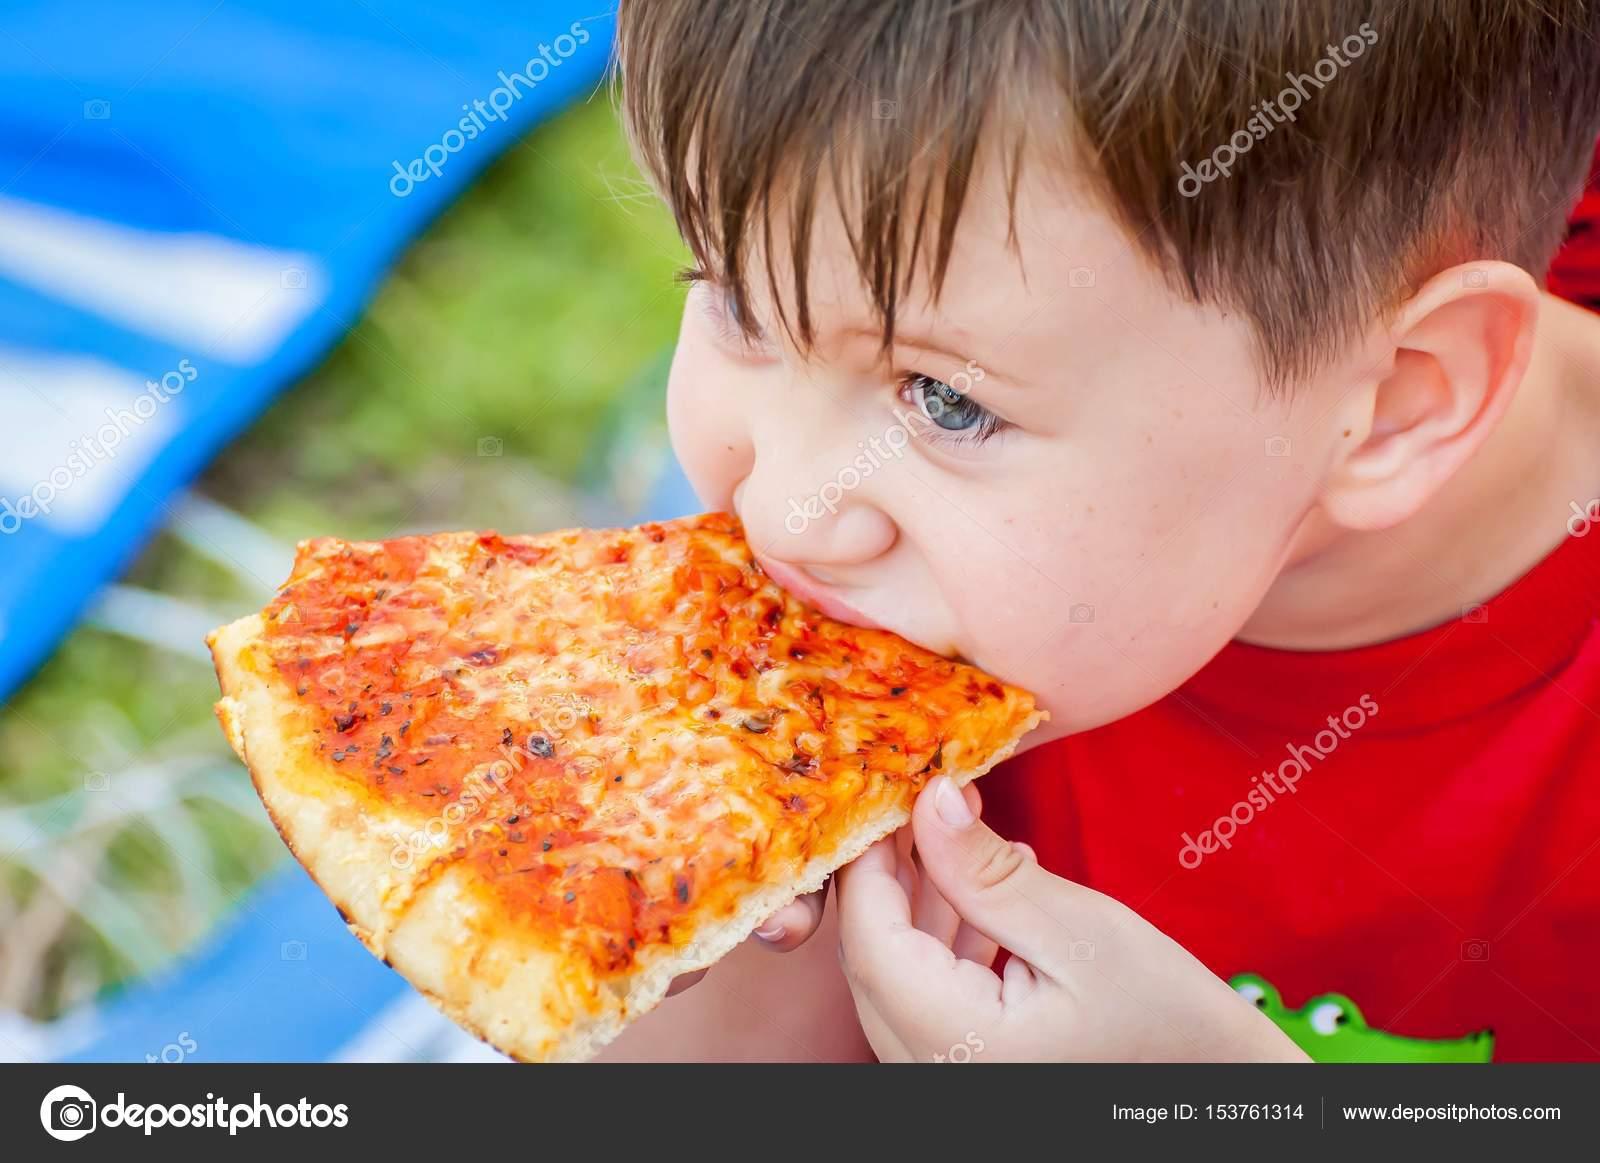 Cute Little Kid Taking A Bite From Delicious Margarita Pizza Slice Photo By Roman Yanushevsky